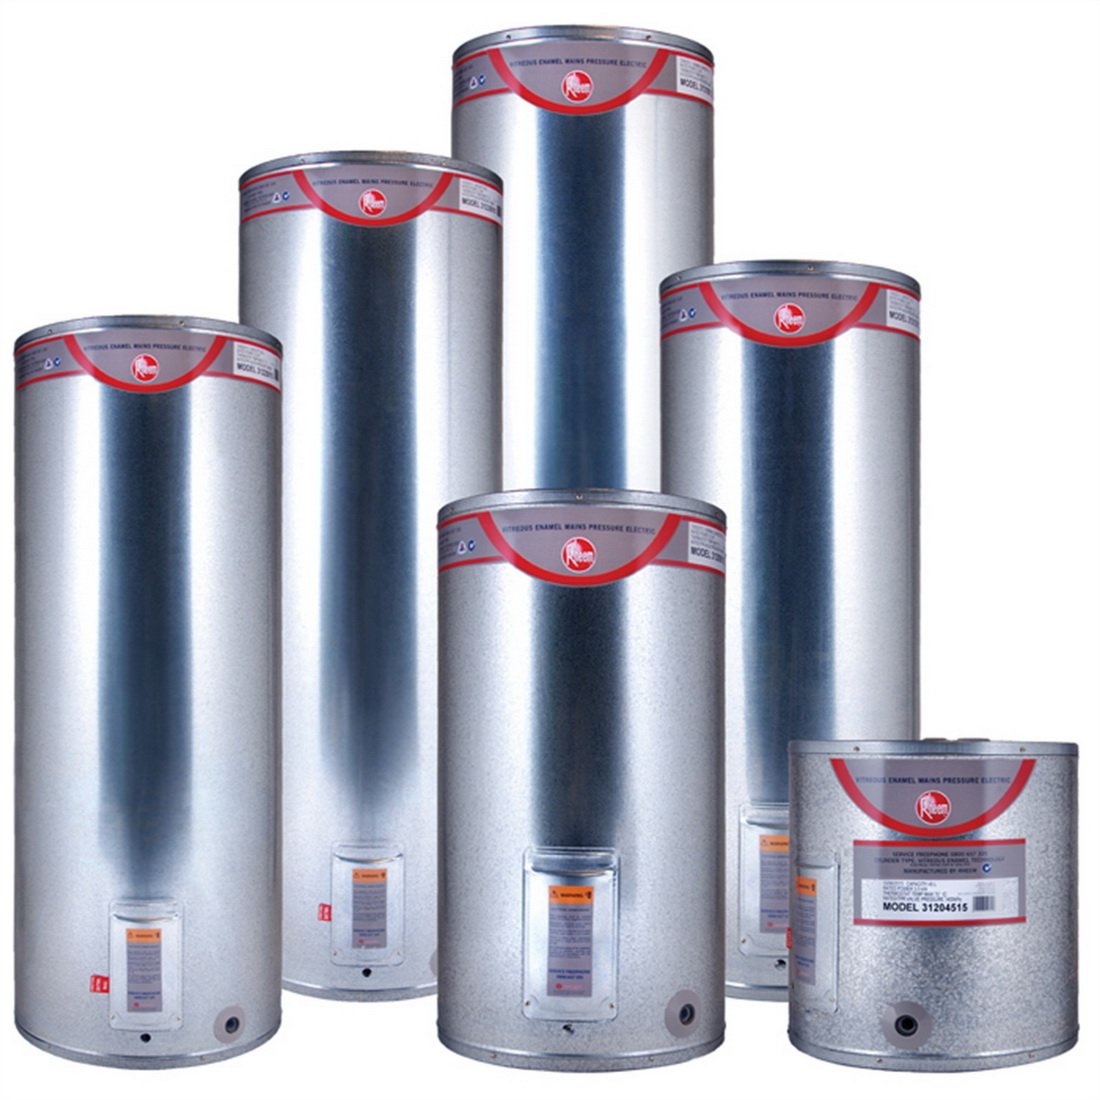 Rheem Mains Pressure Electric Hot Water Cylinder 135L 488 x 1326mm 3kW Vitreous Enamel 31213515